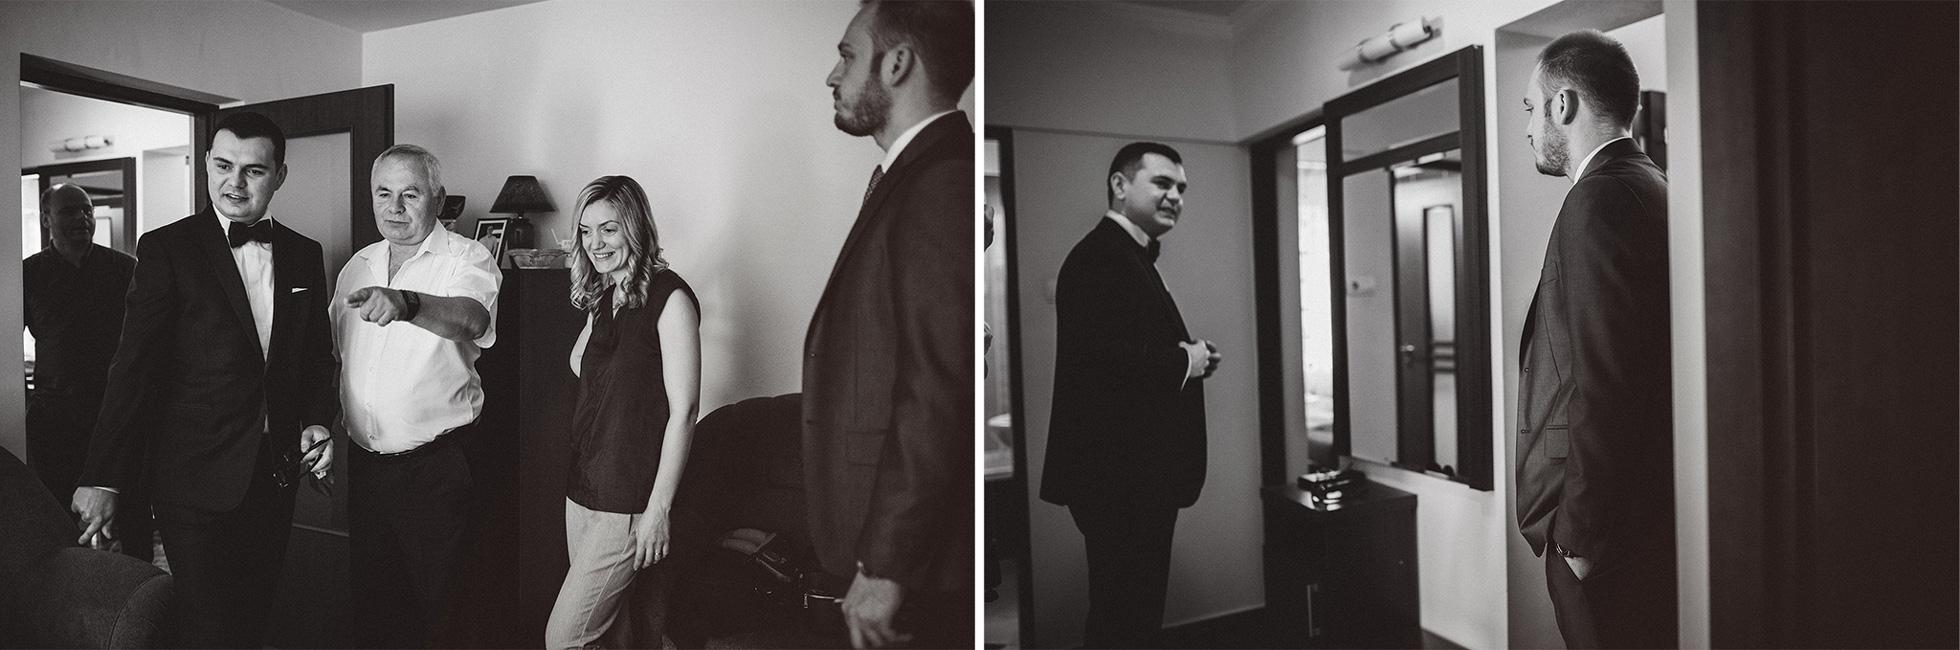 Liana-+-Florin-{wedding}-016